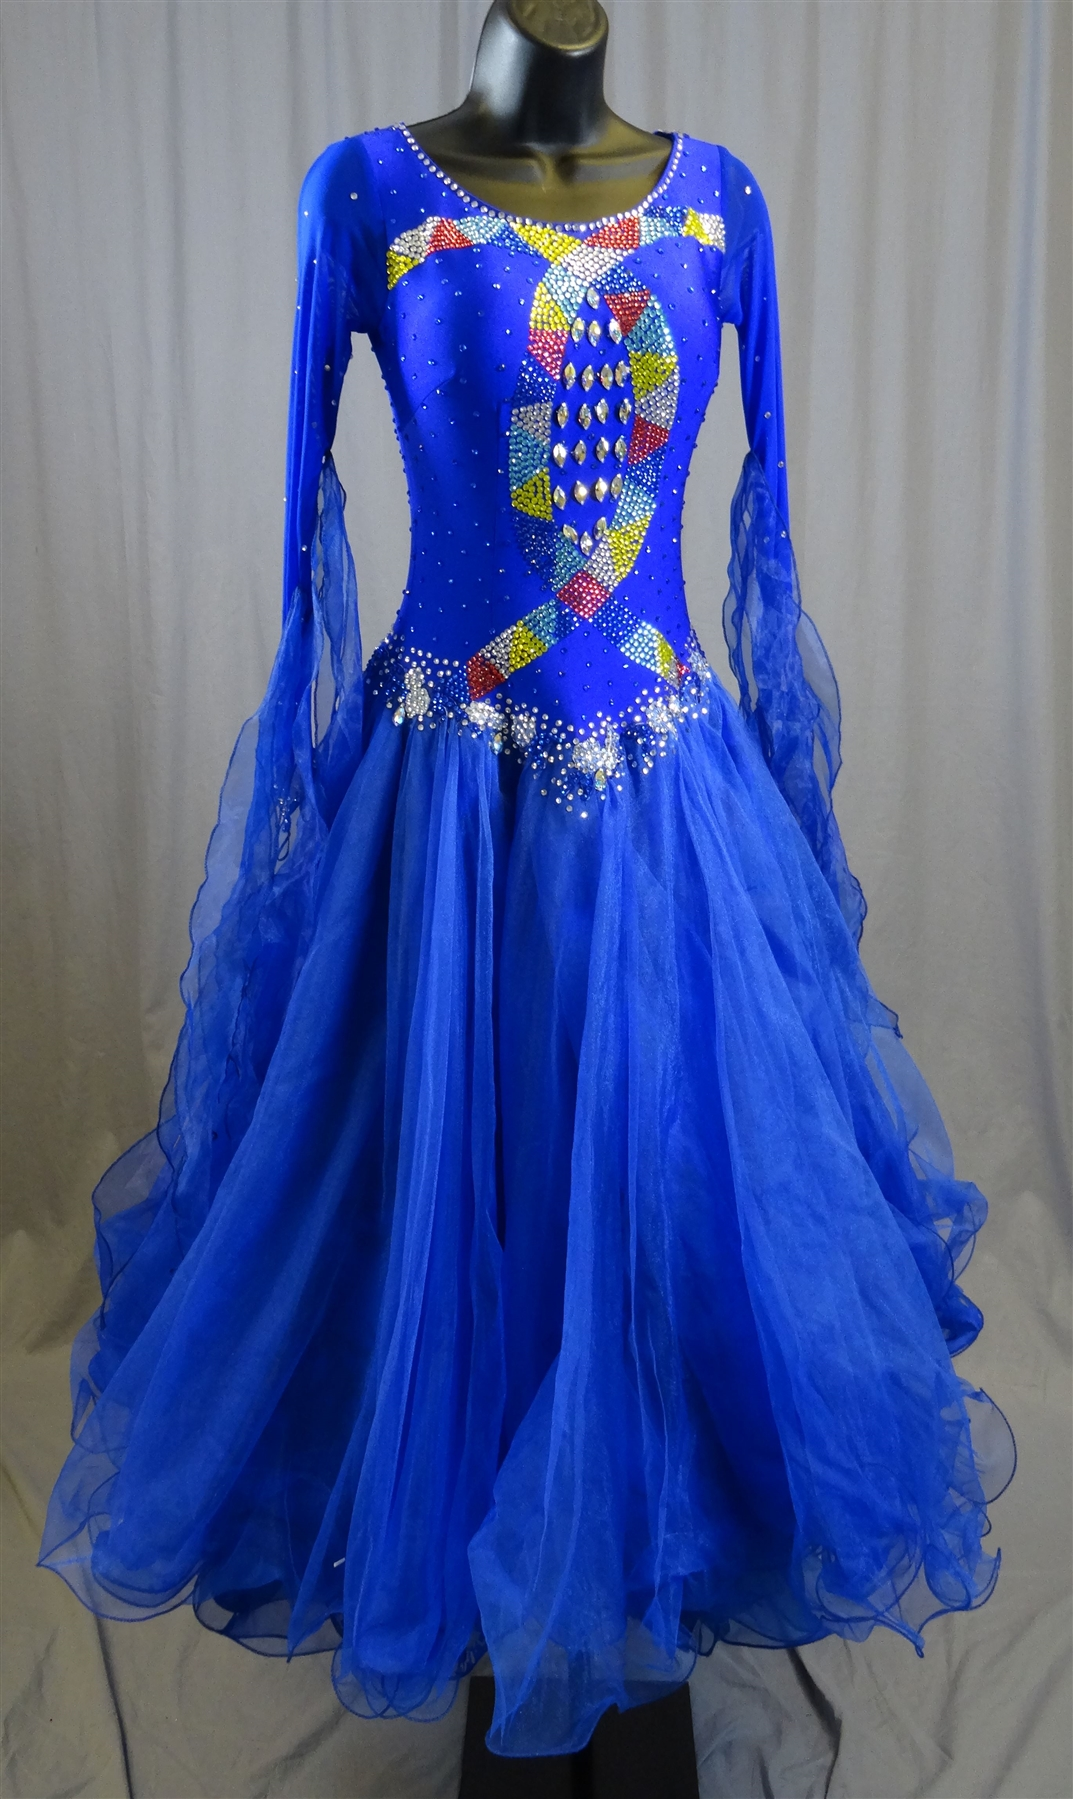 Elegant Royal Blue Ballroom Dress